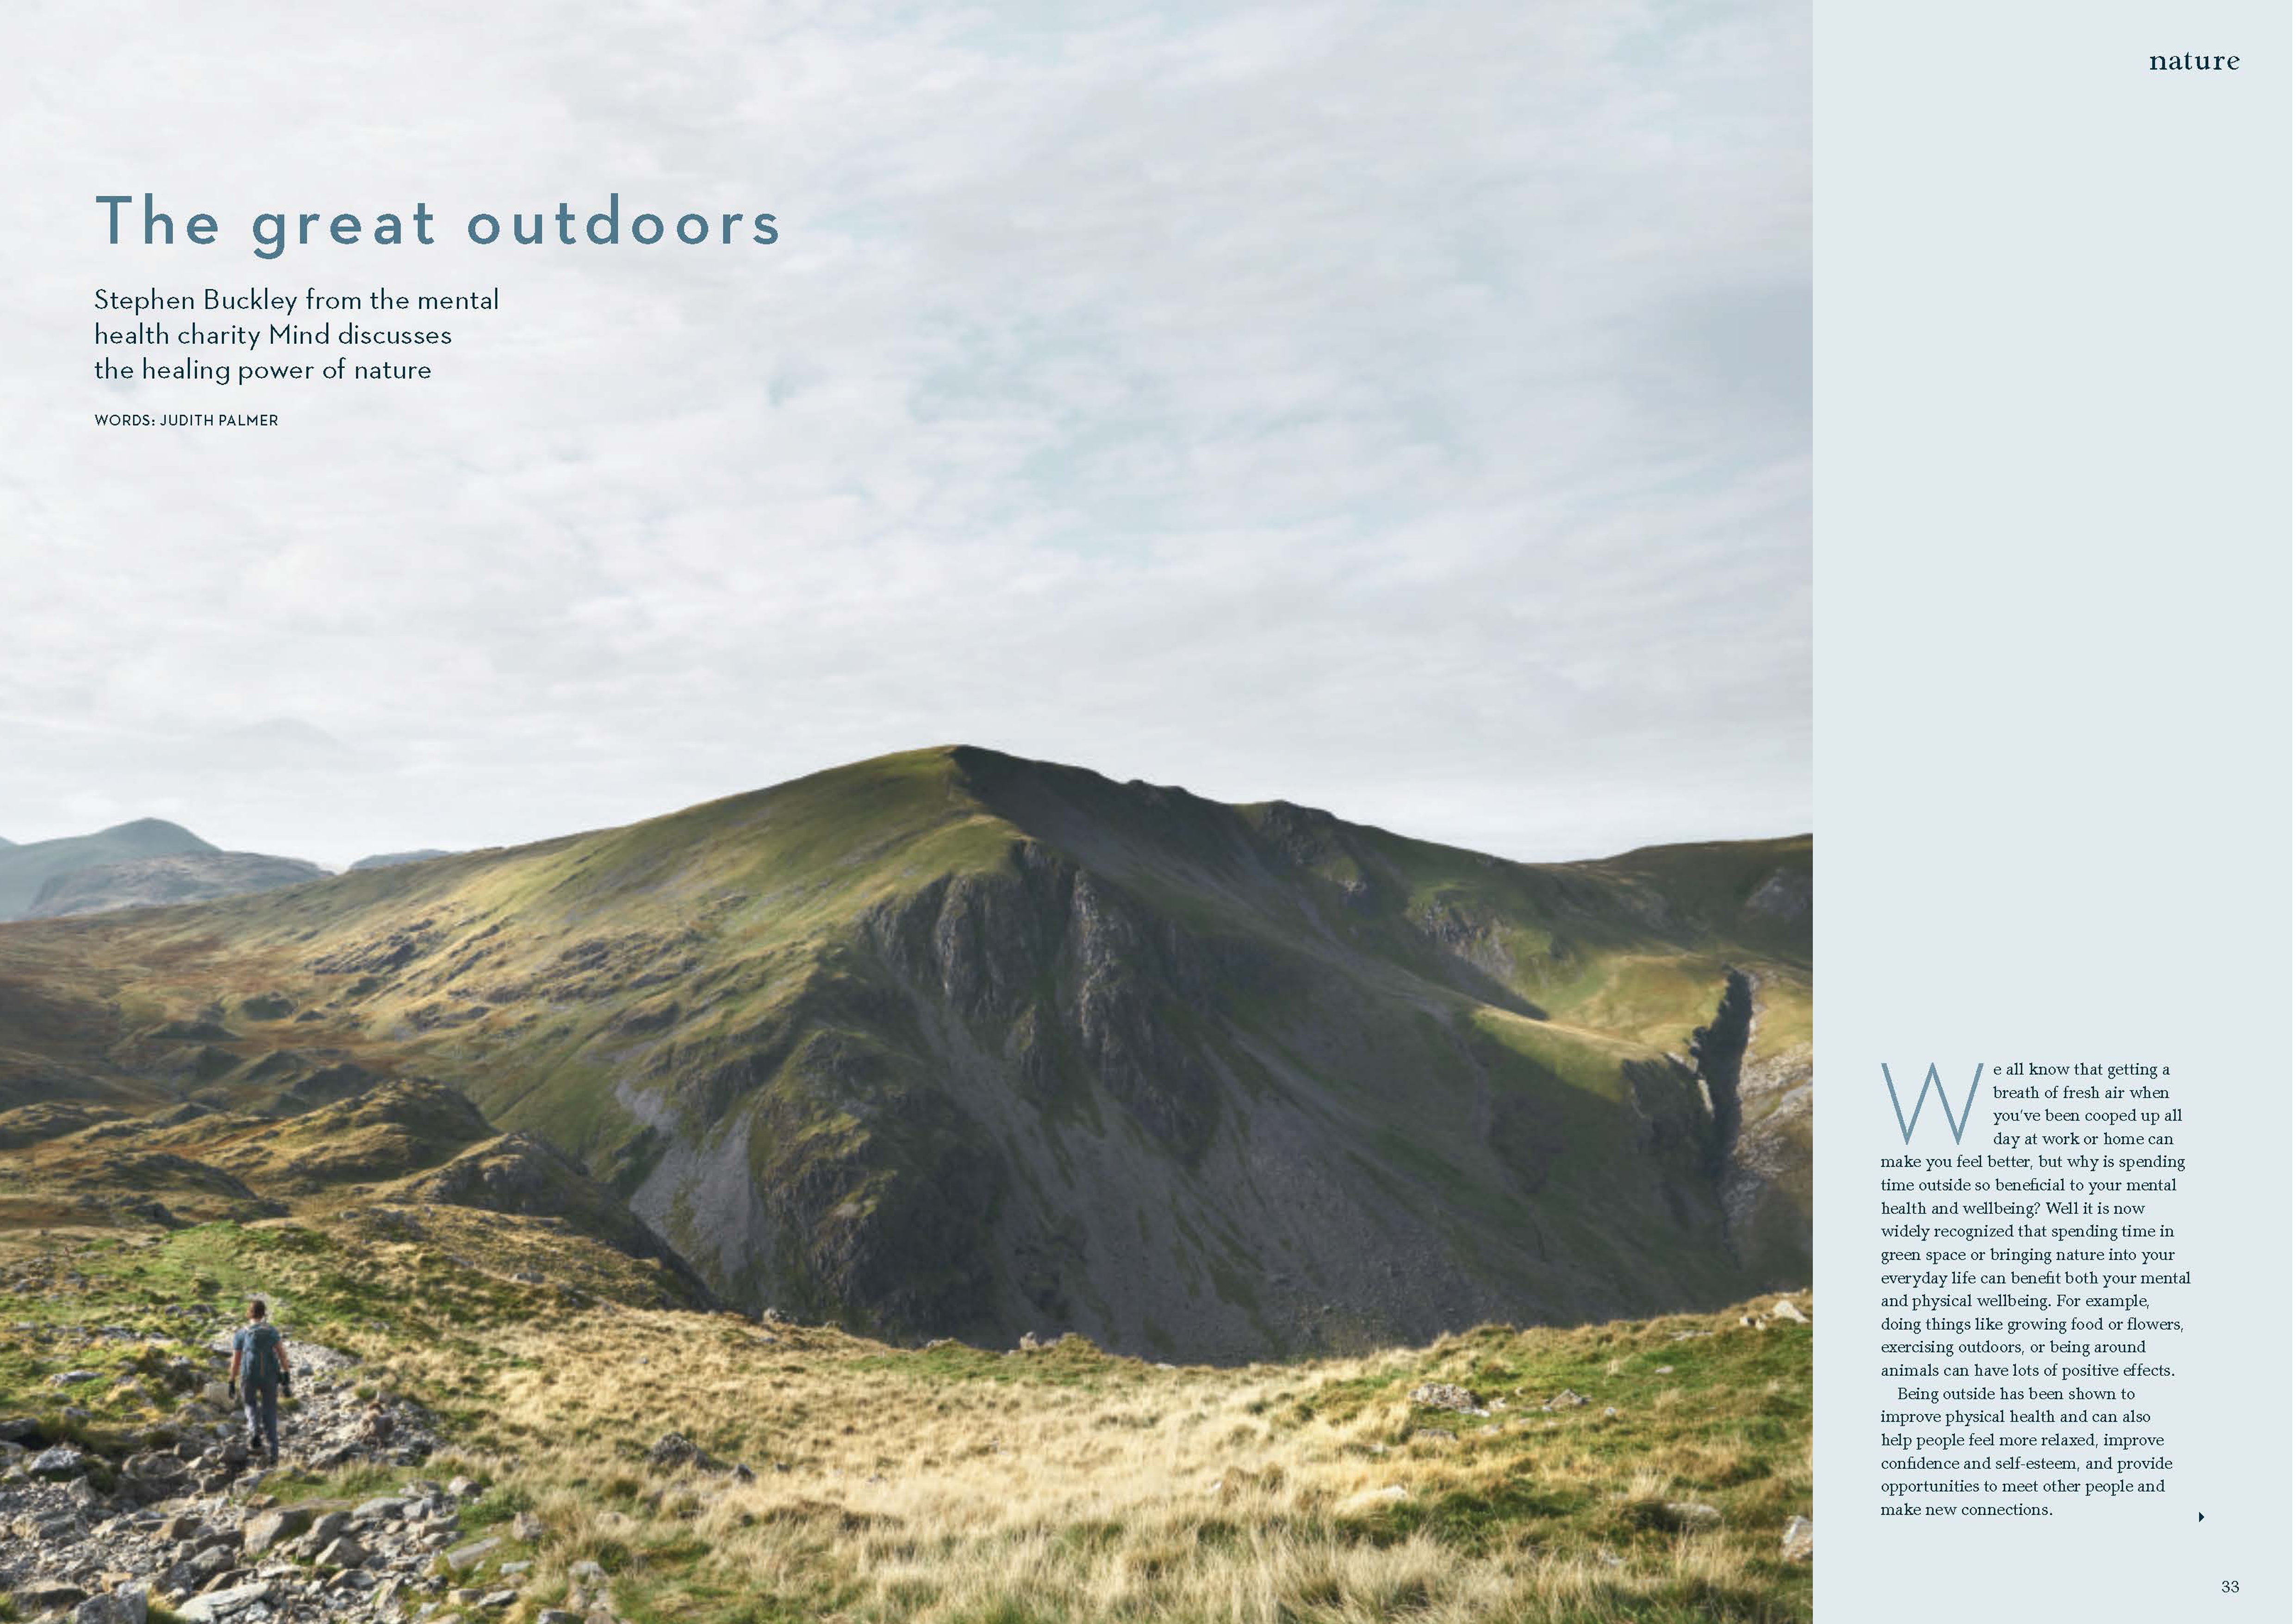 Life & wellbeing magazine